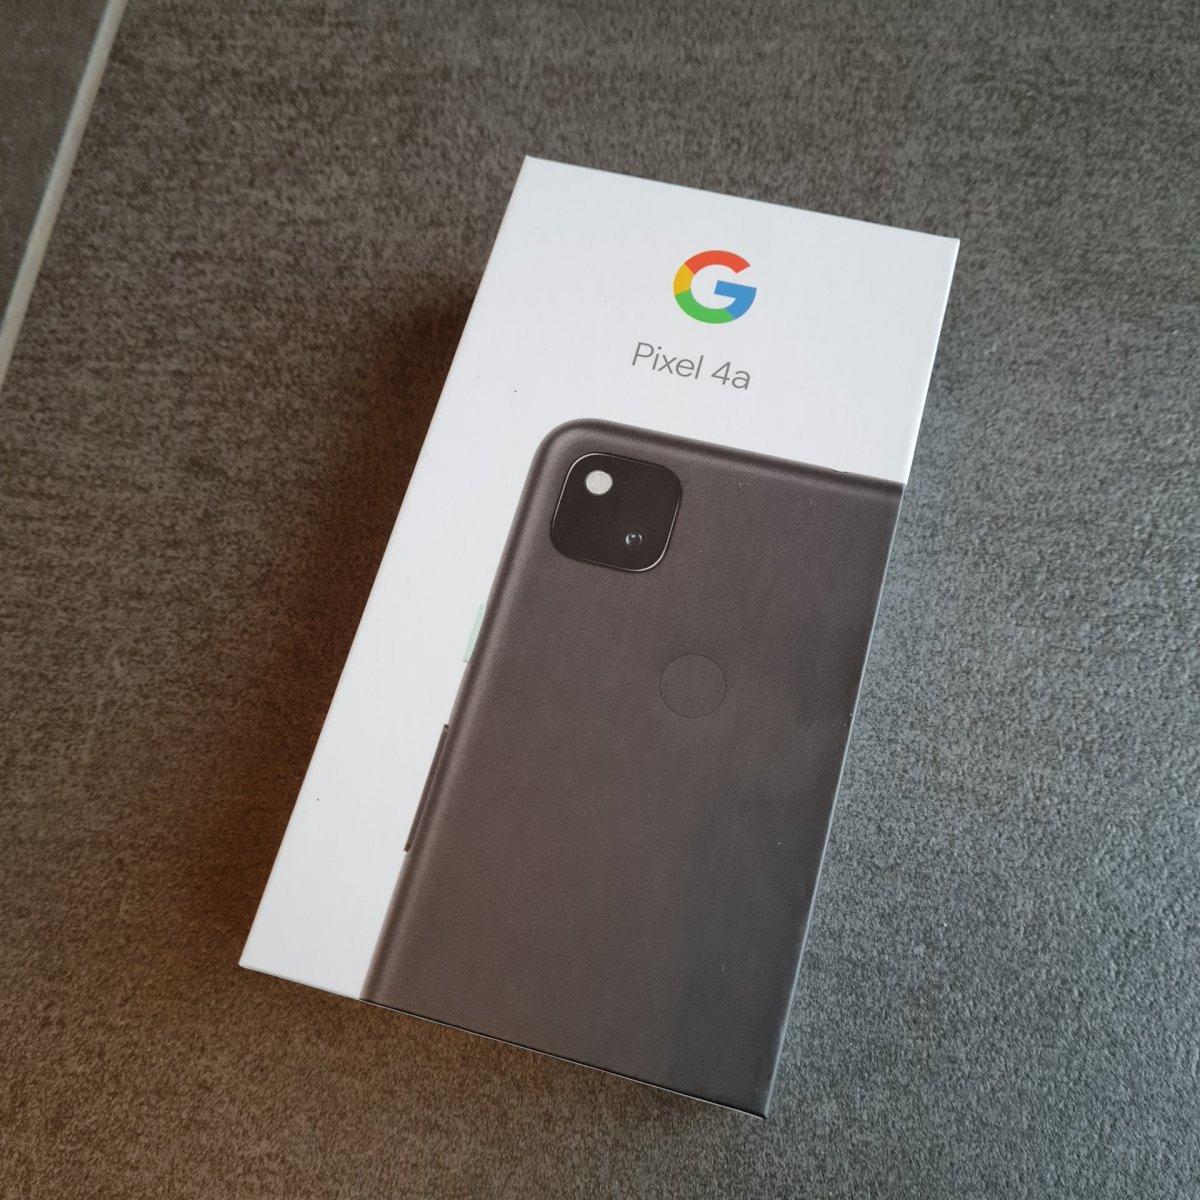 Google Pixel 4a - Verpackung